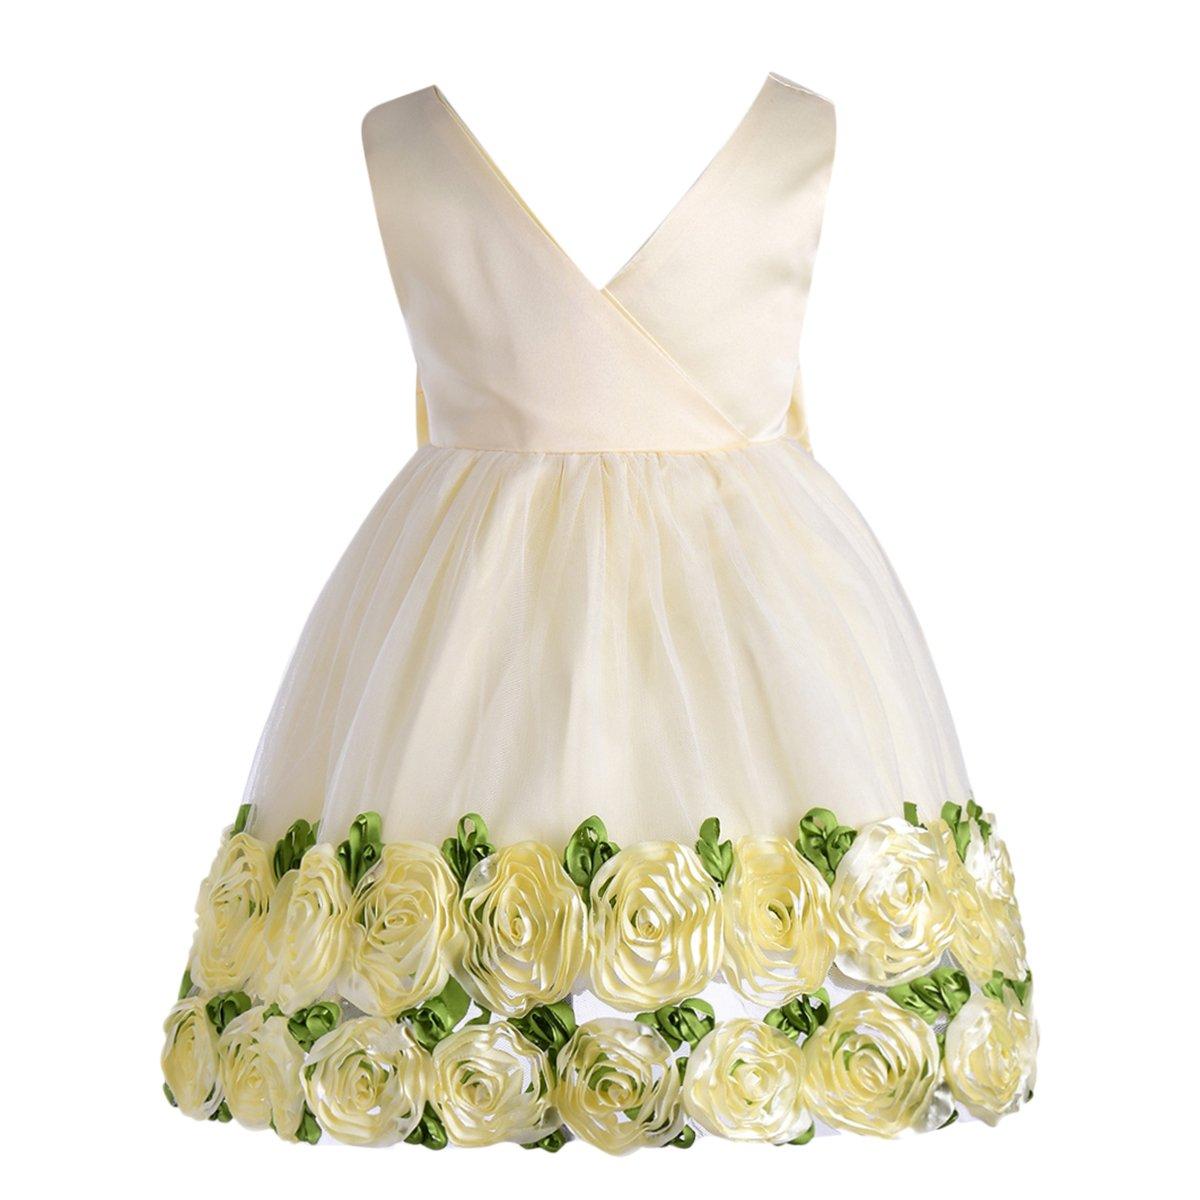 OBEEII Flower Girl Tutu Dress Wedding Birthday Party Formal Event